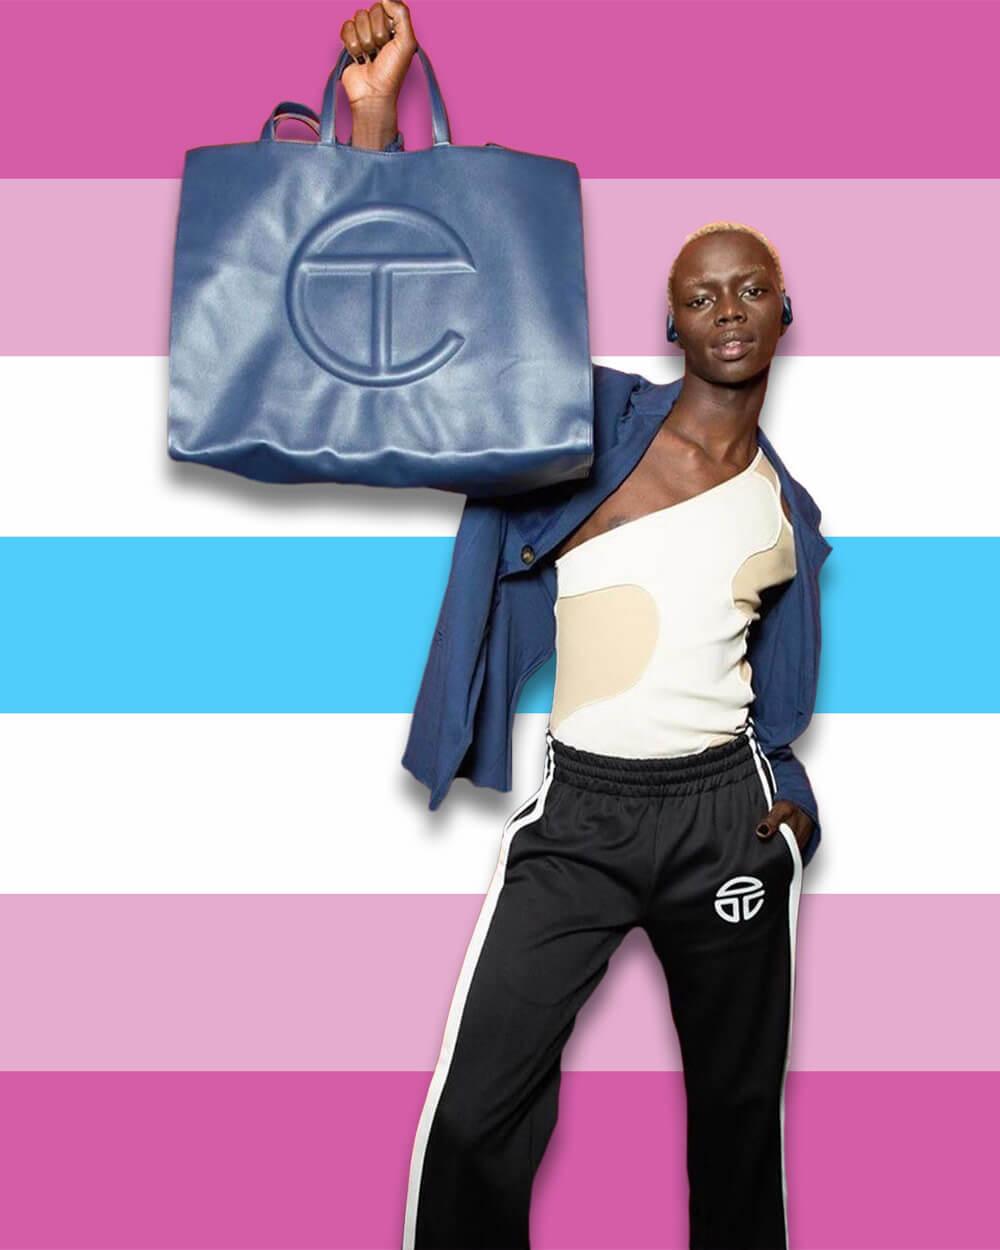 Femboy fashion Telfar shopping bag